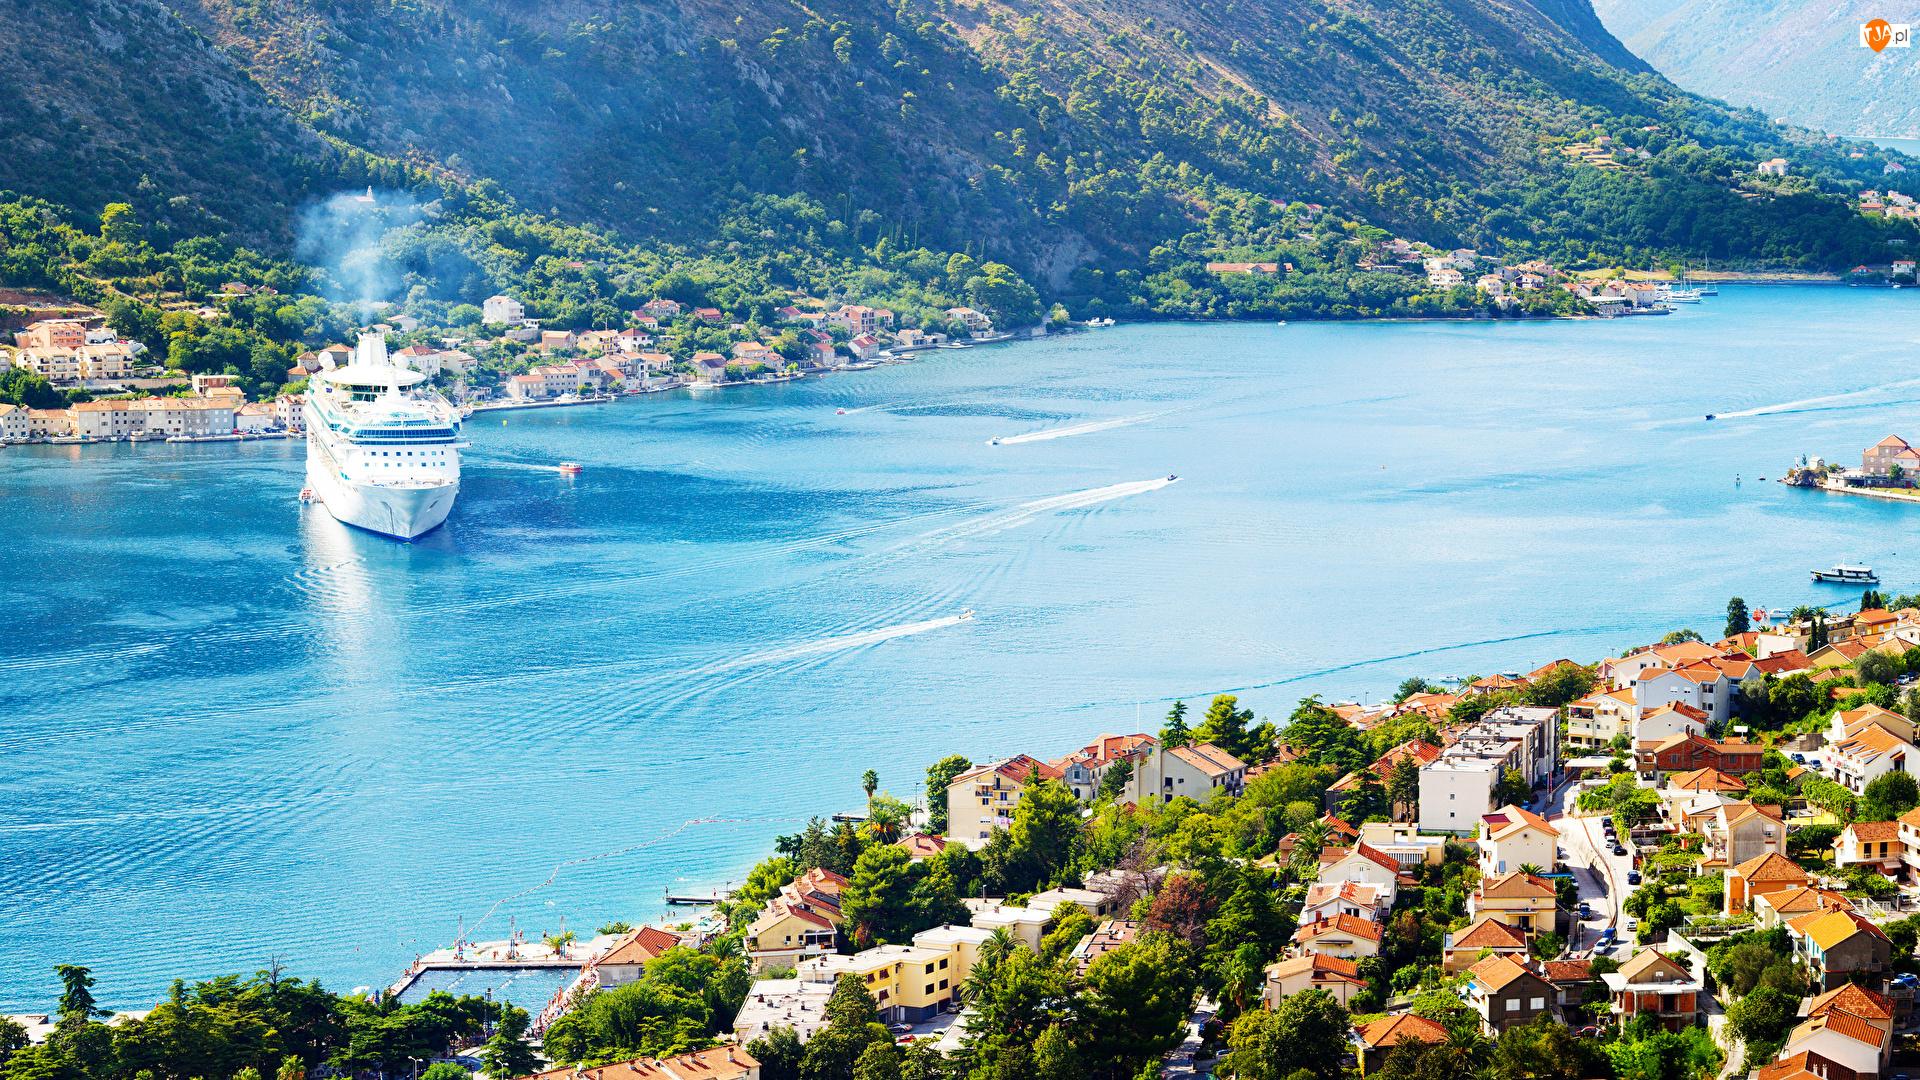 Zatoka Kotorska, Miasto Kotor, Góry, Czarnogóra, Drzewa, Statek, Domy